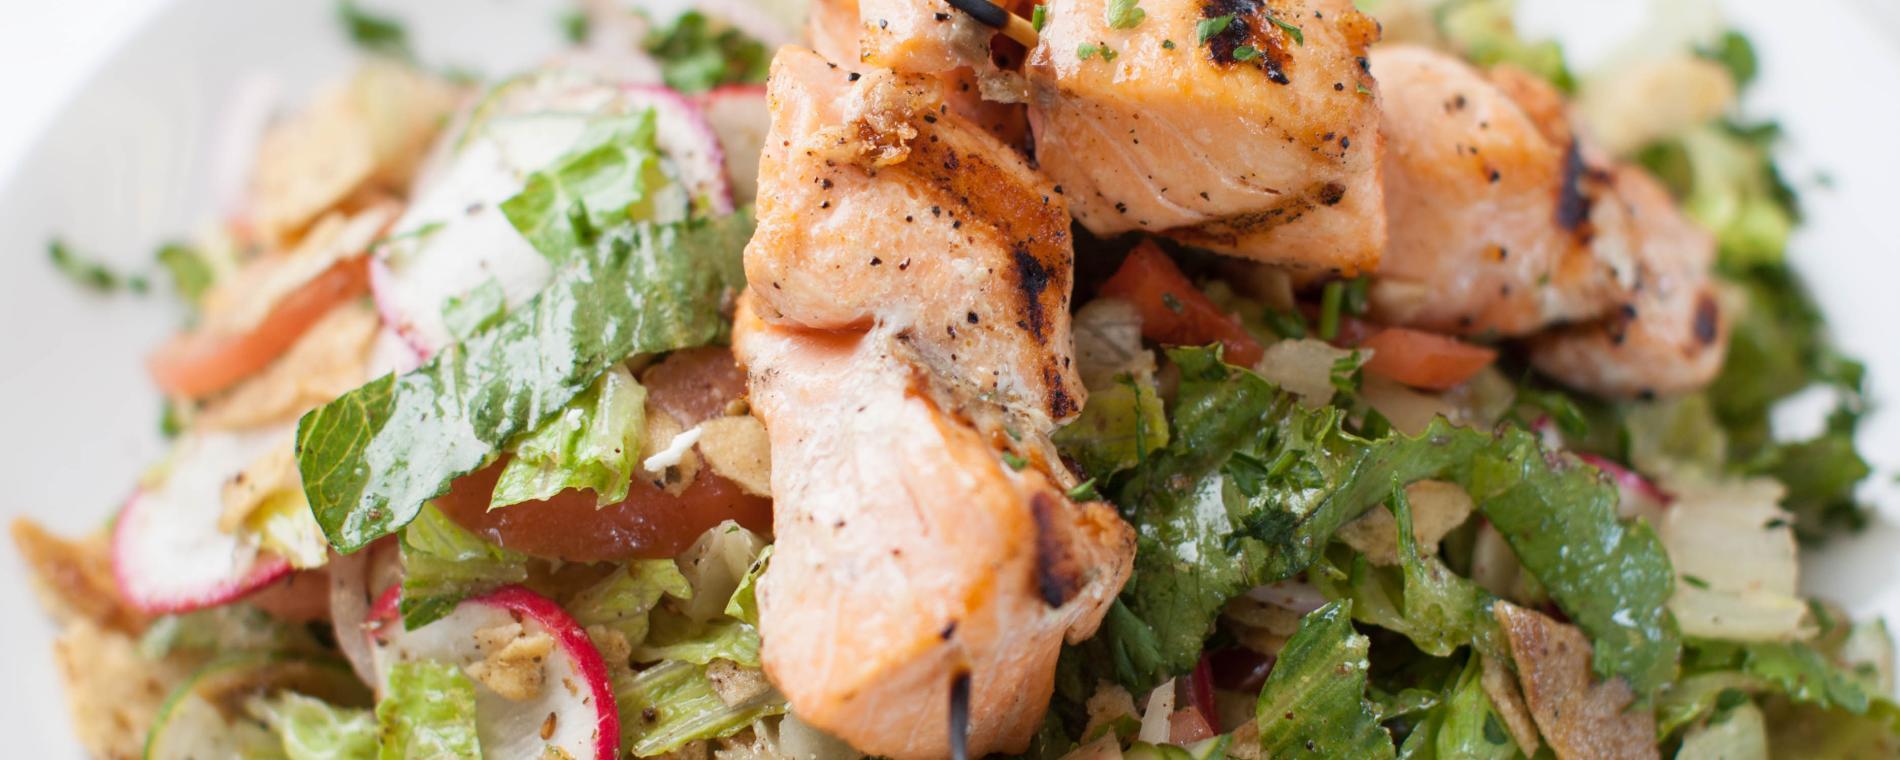 Meddys NE salmon salad Visit Wichita